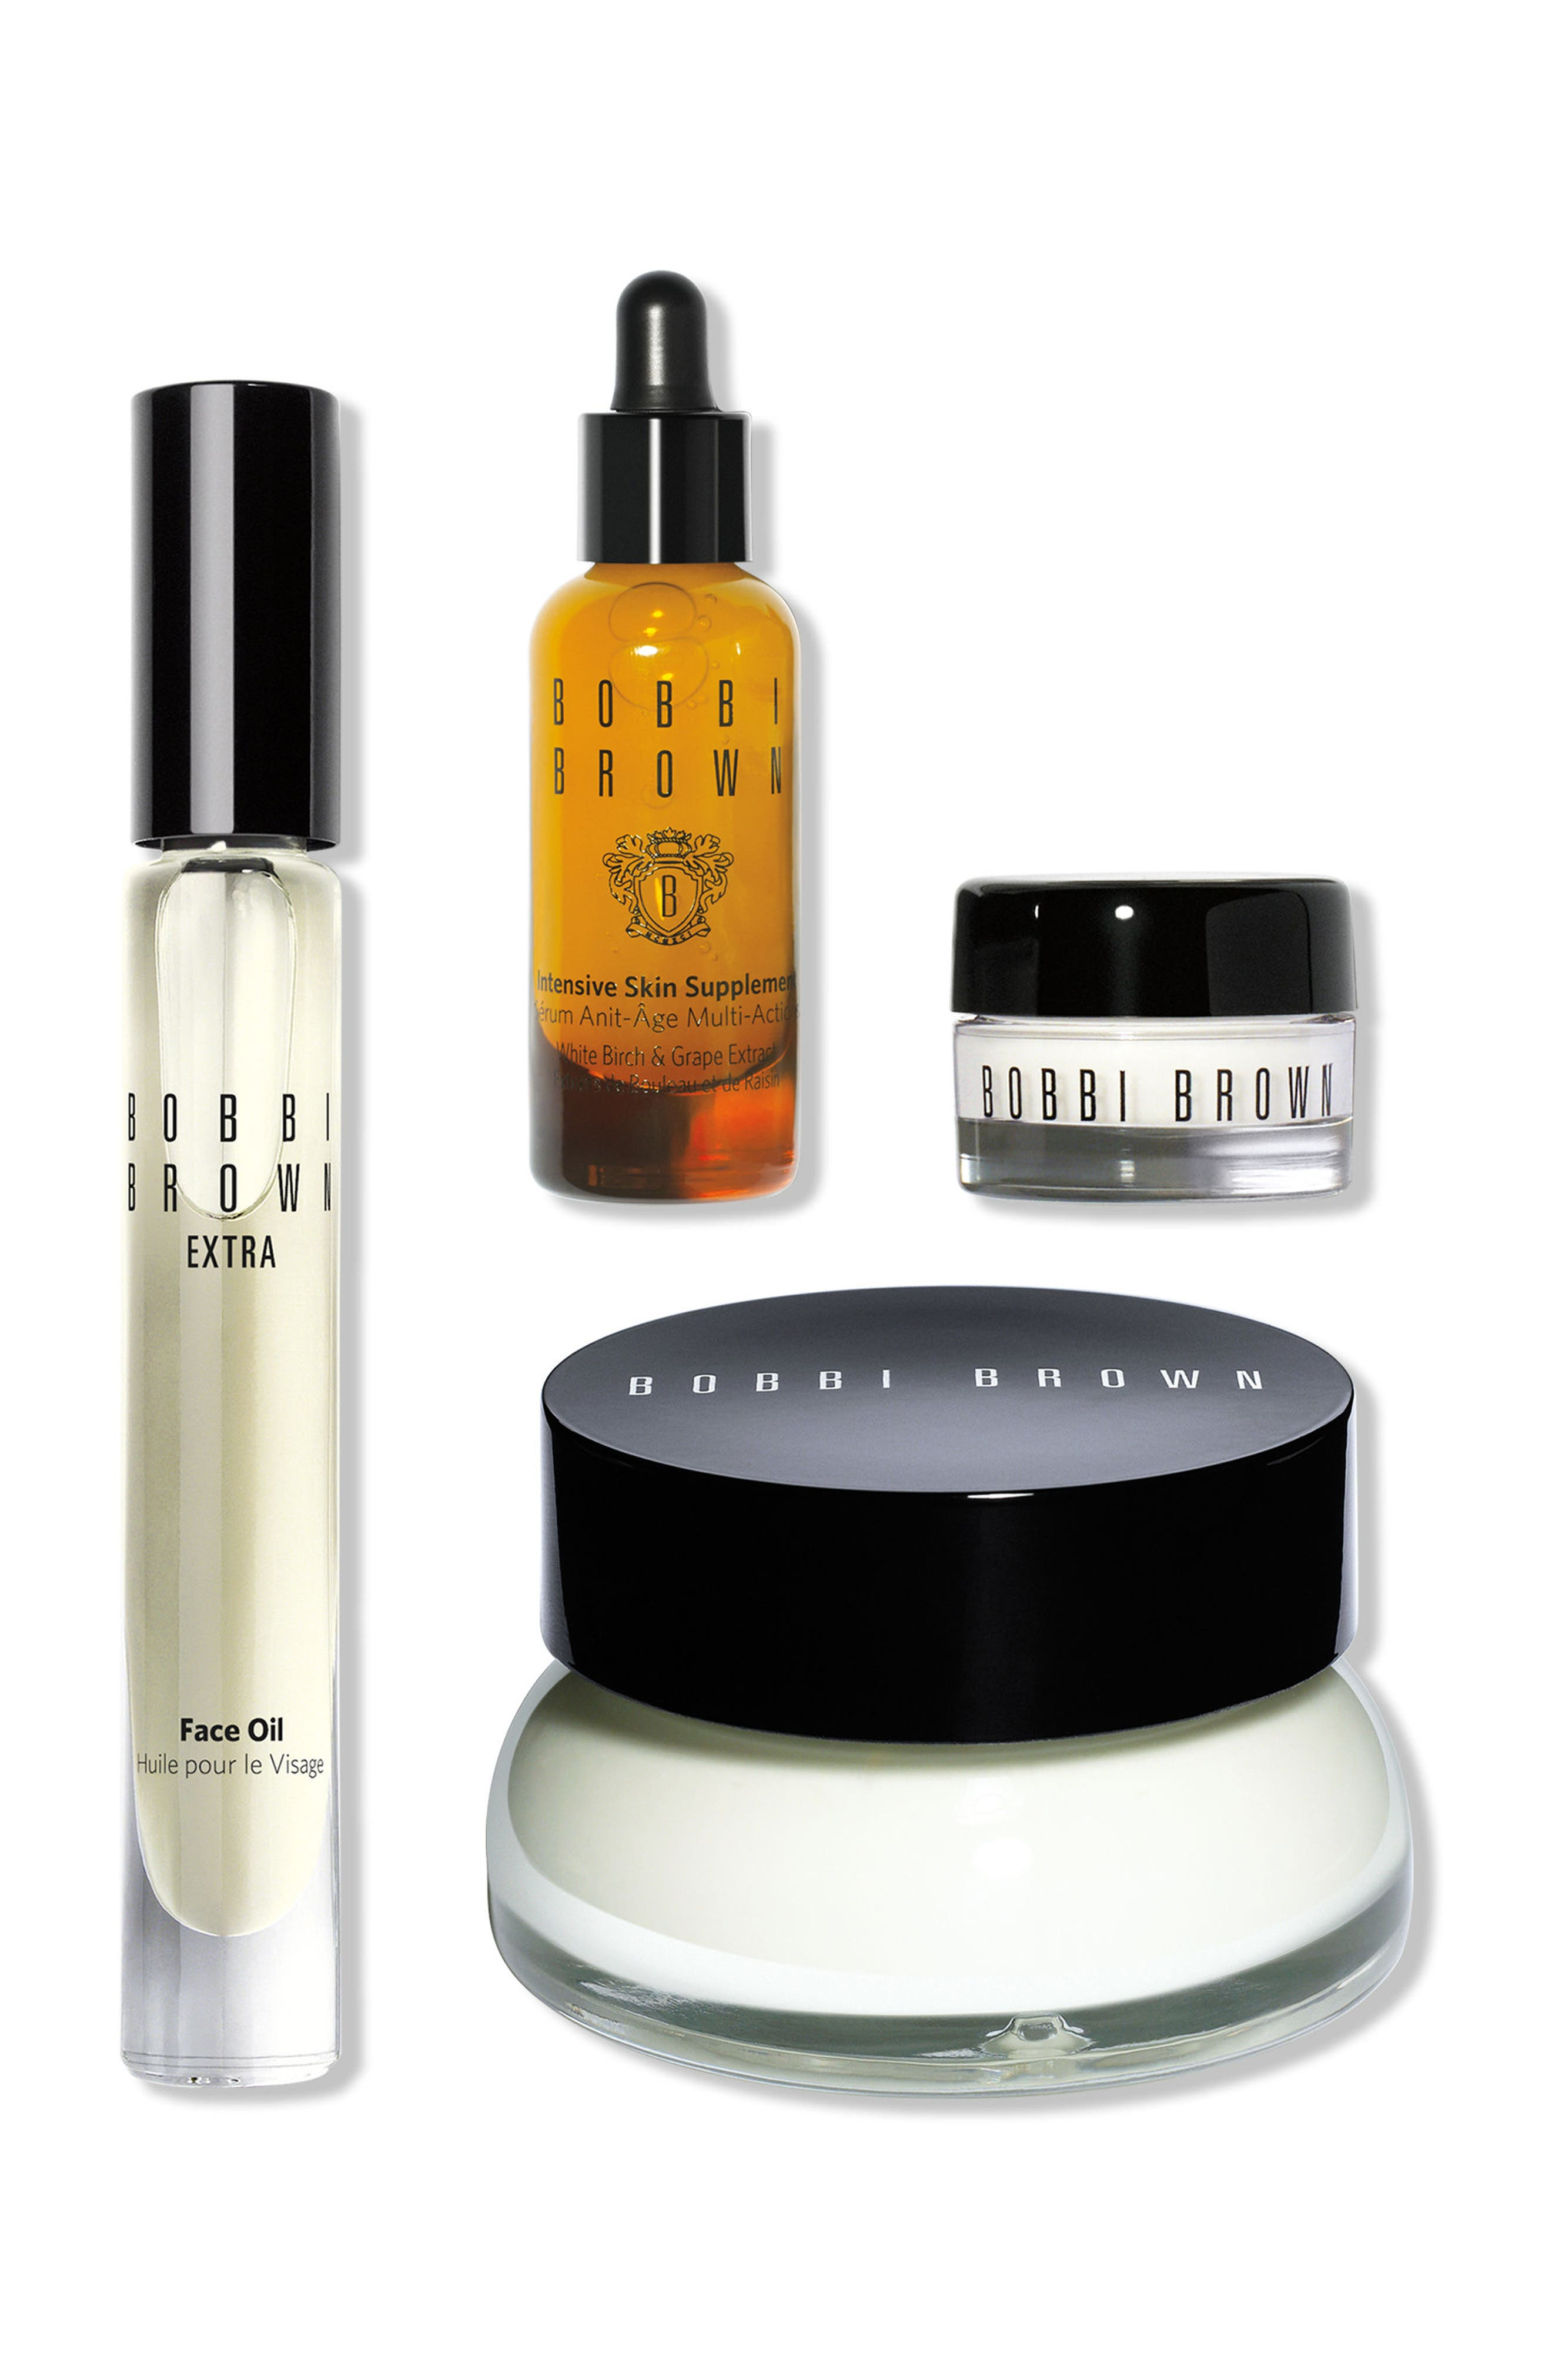 Bobbi Brown Nourish & Glow Skin Care Set (Nordstrom Exclusive) ($170.40 Value)